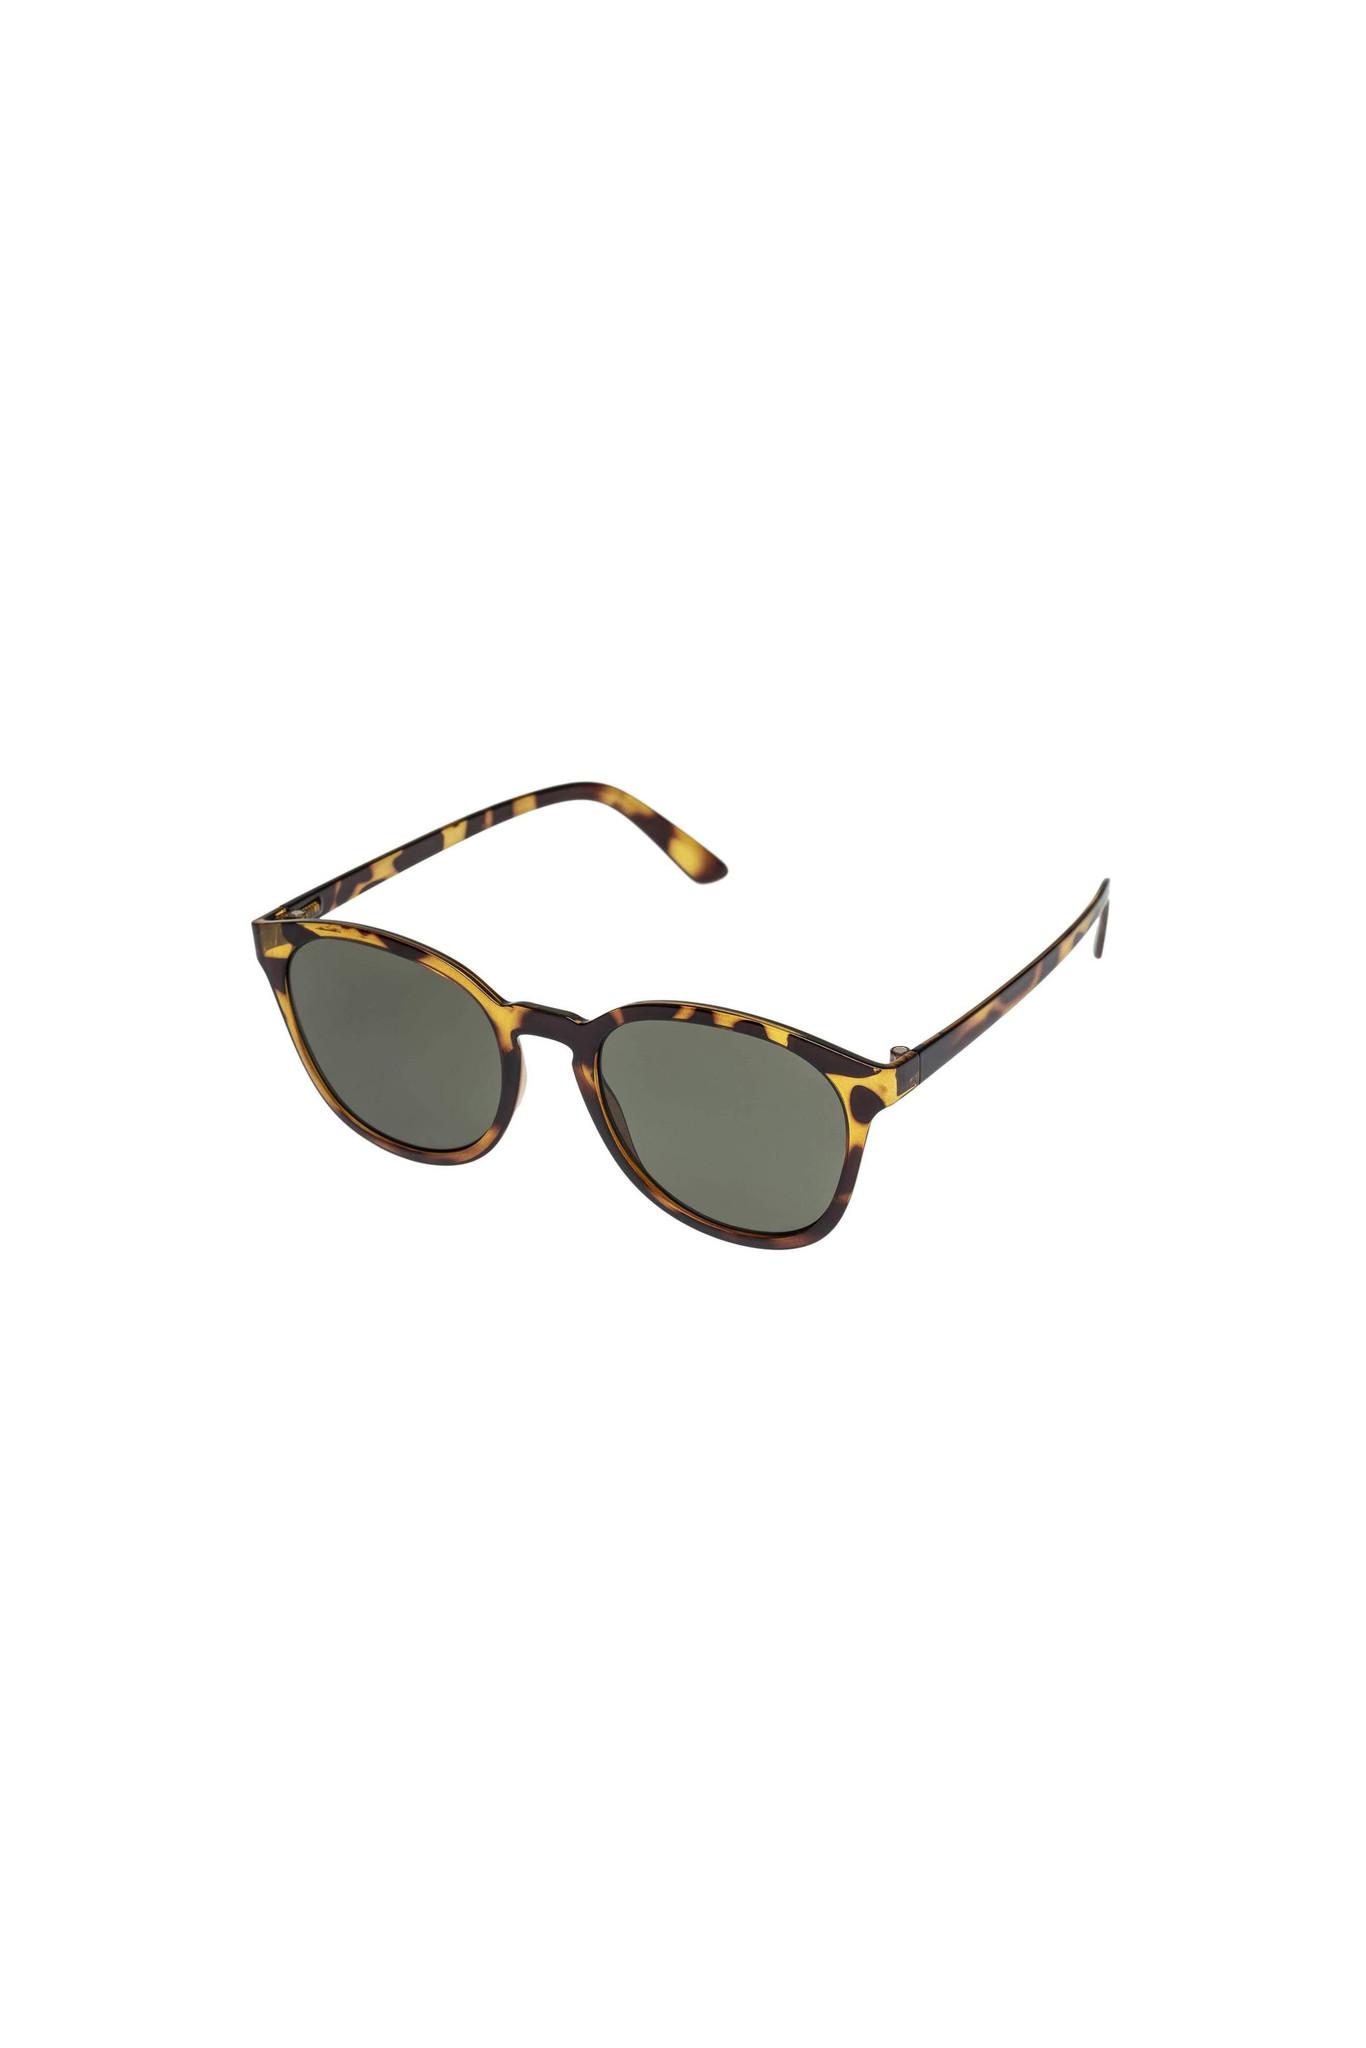 Renegade Sunglasses - Syrup Tortoise-2